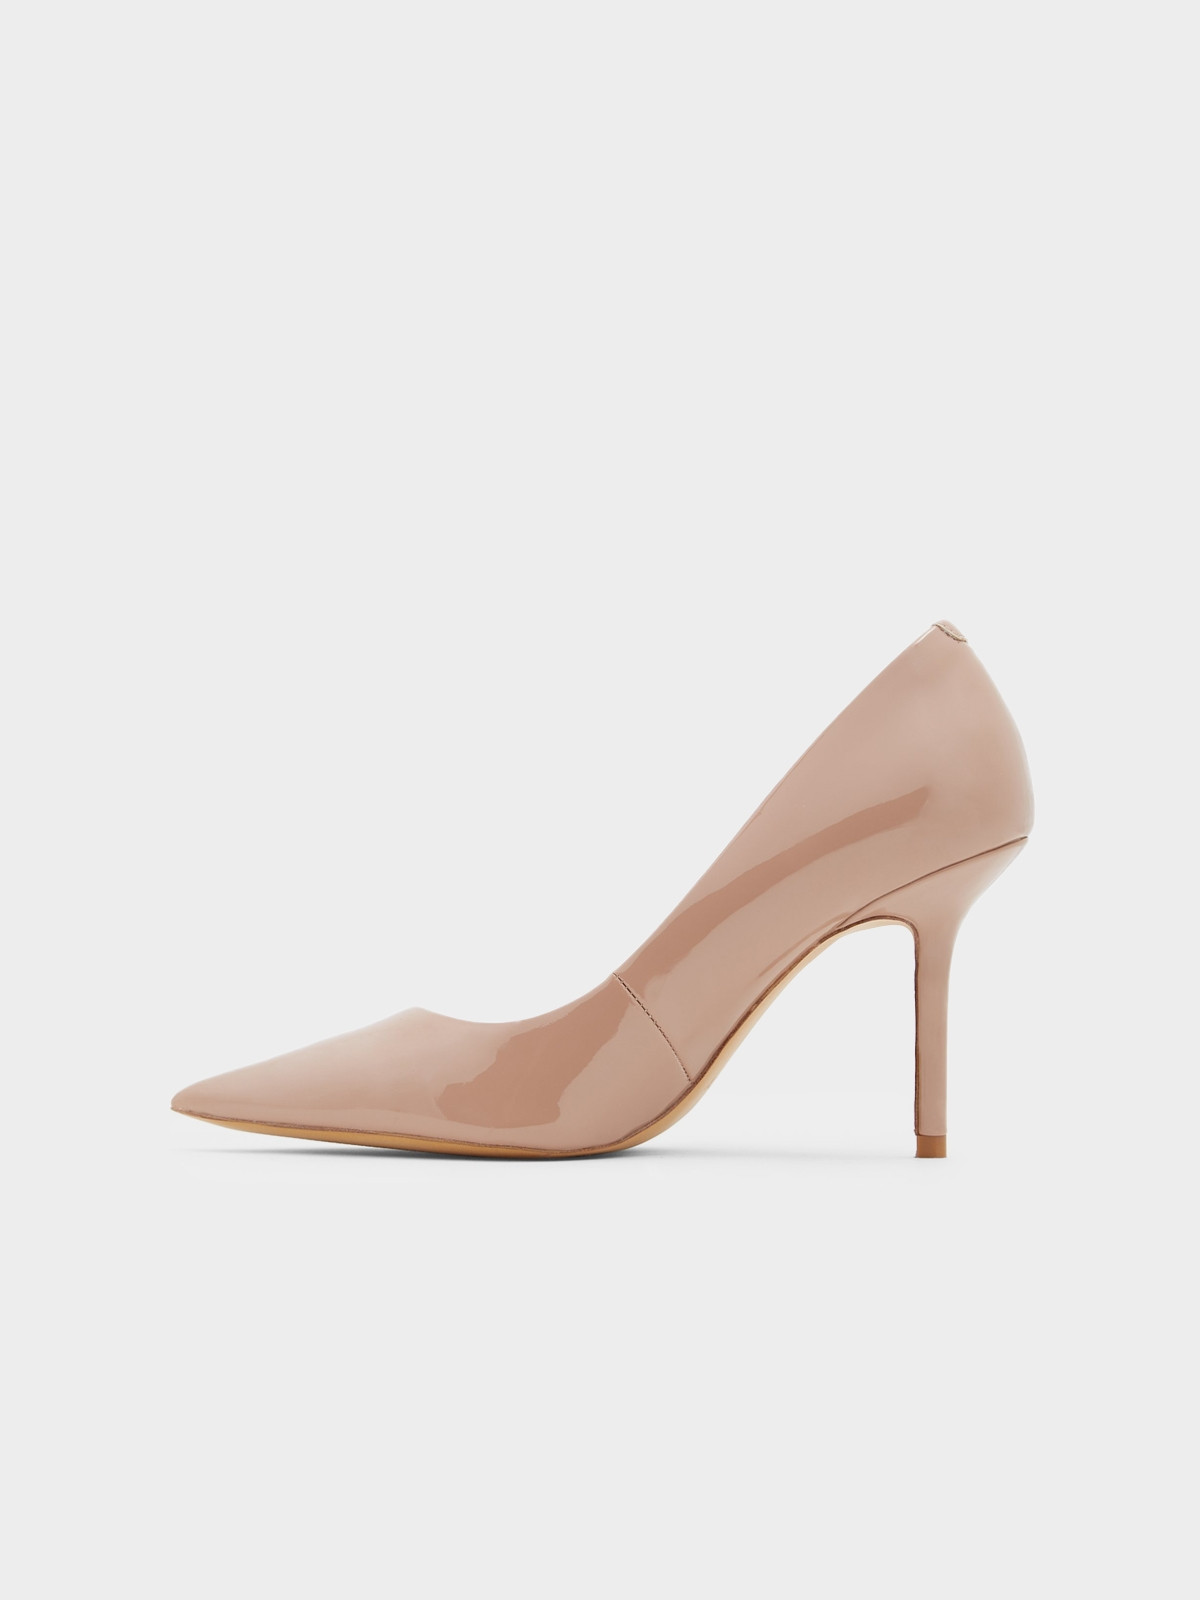 Aldo Laurie Pointed Toe Heels Light Beige